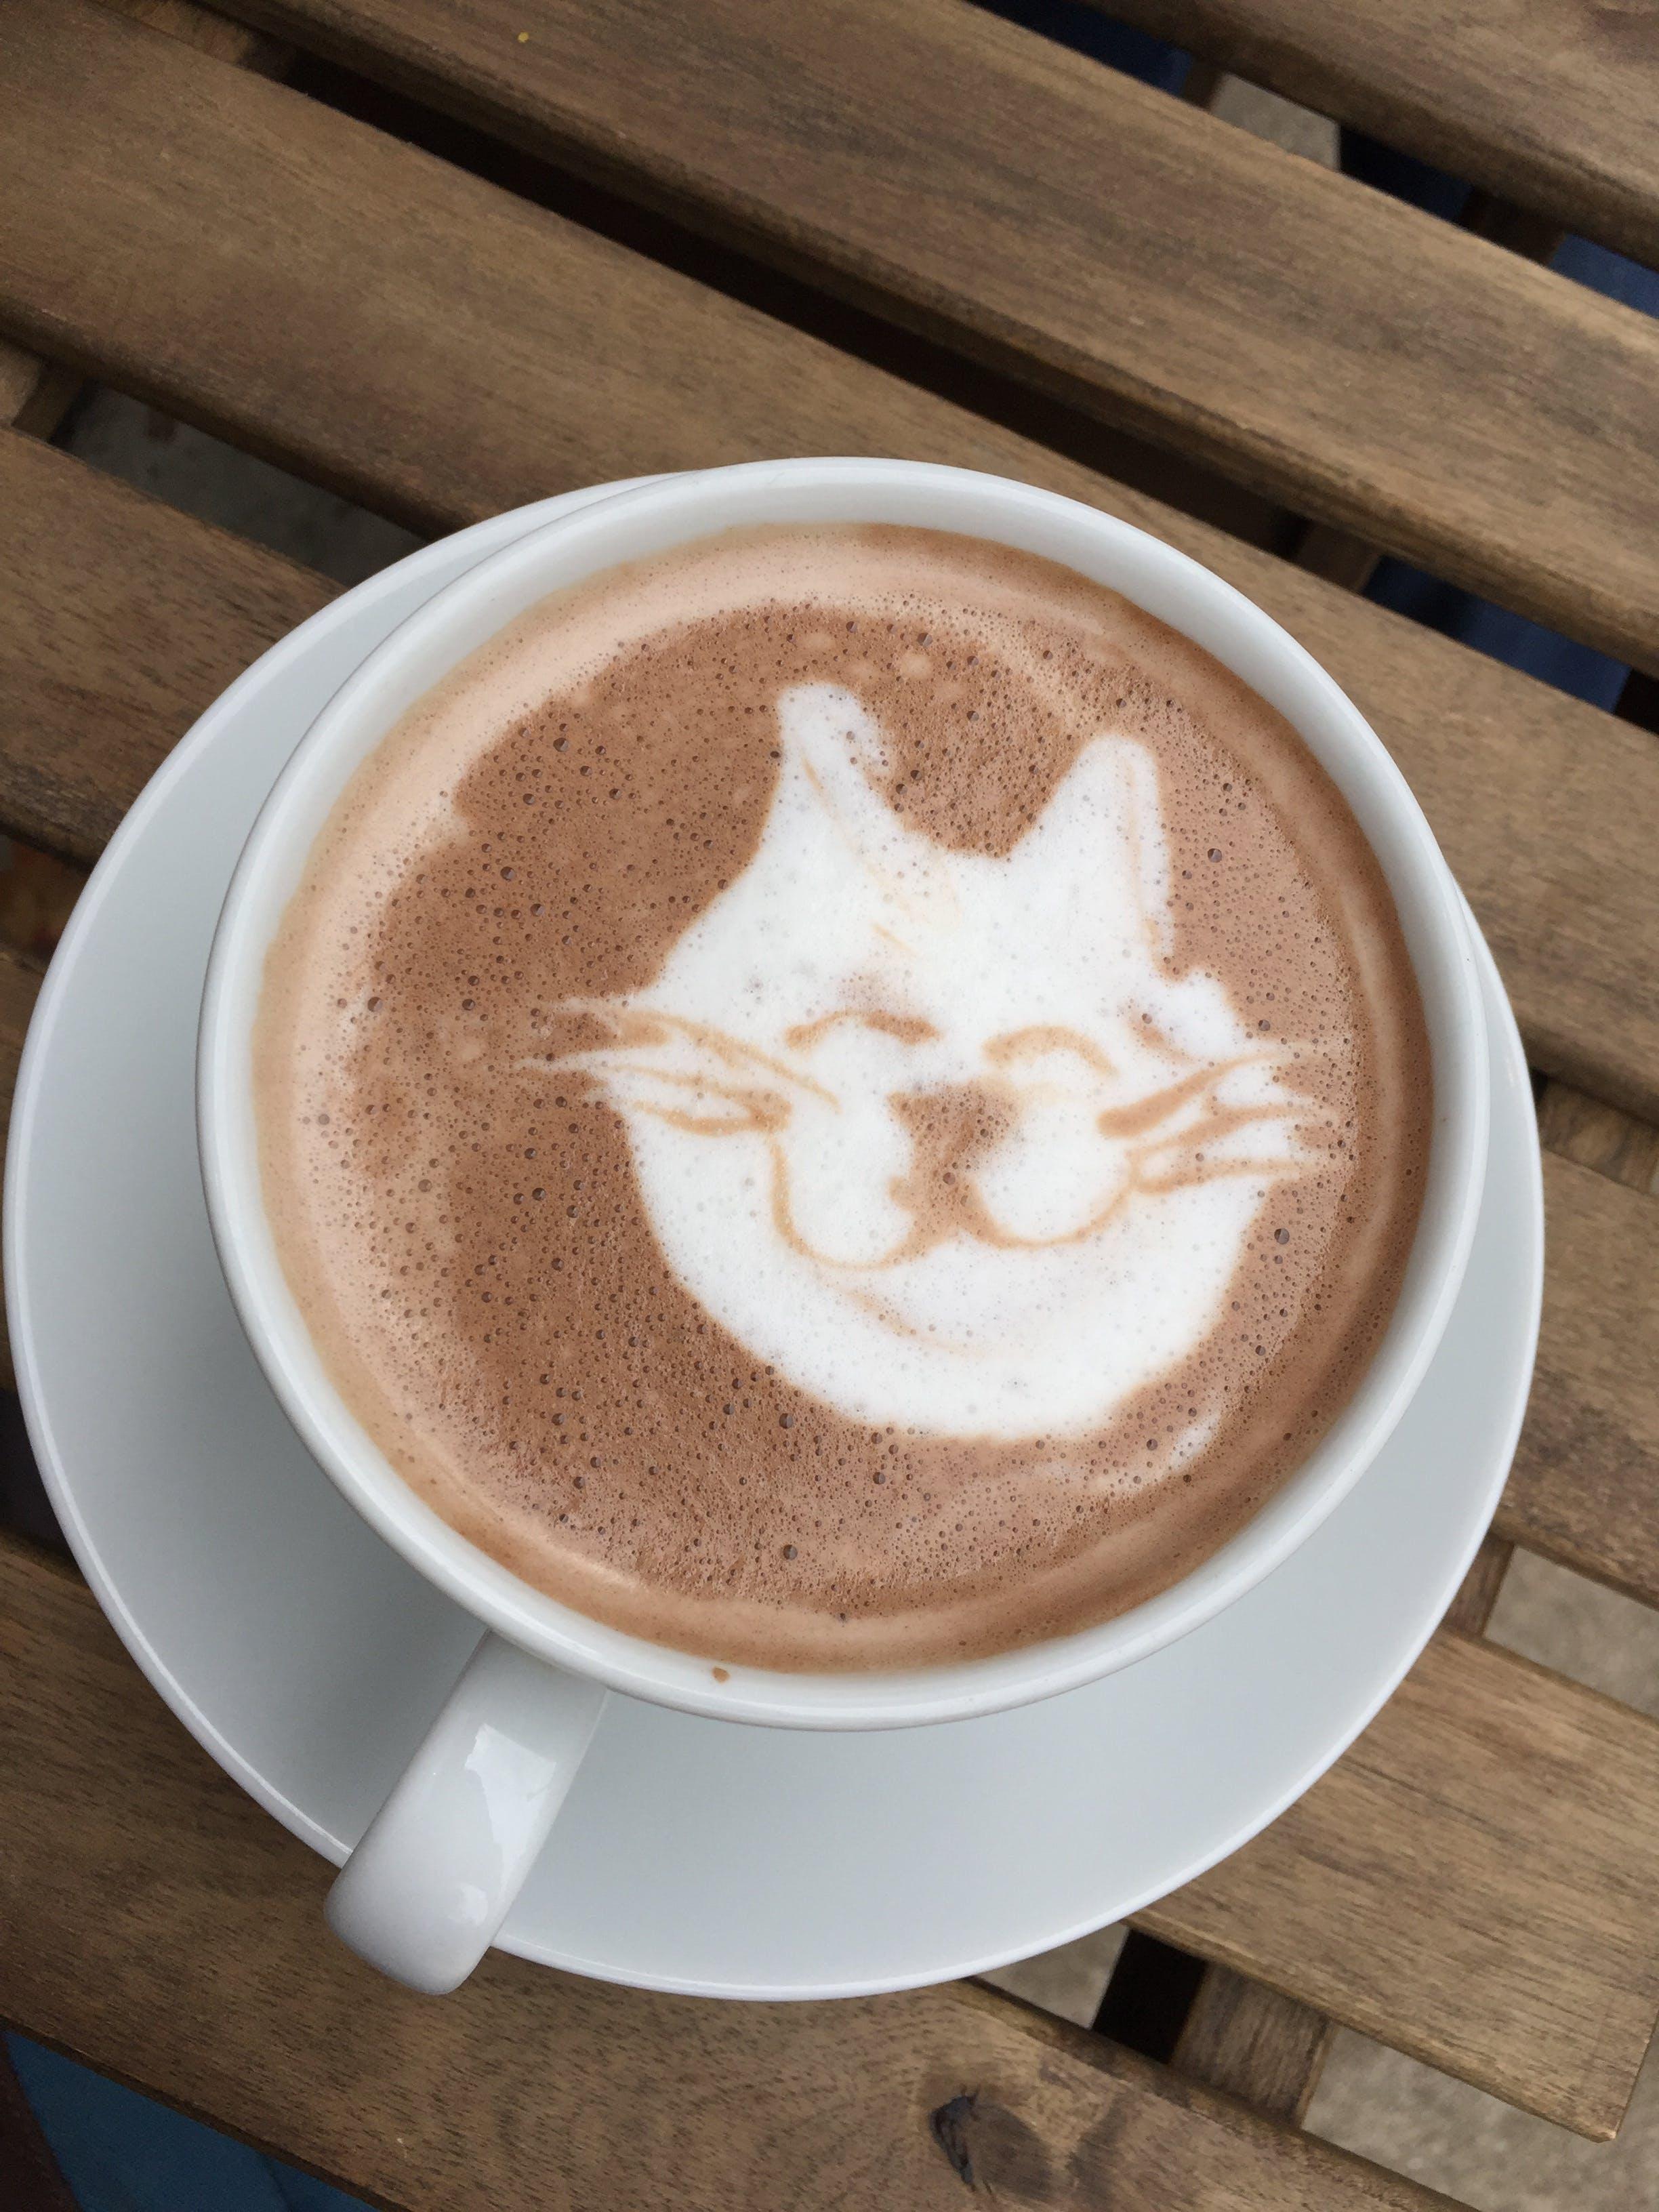 Free stock photo of cat, chocolate, cocoa, coffee